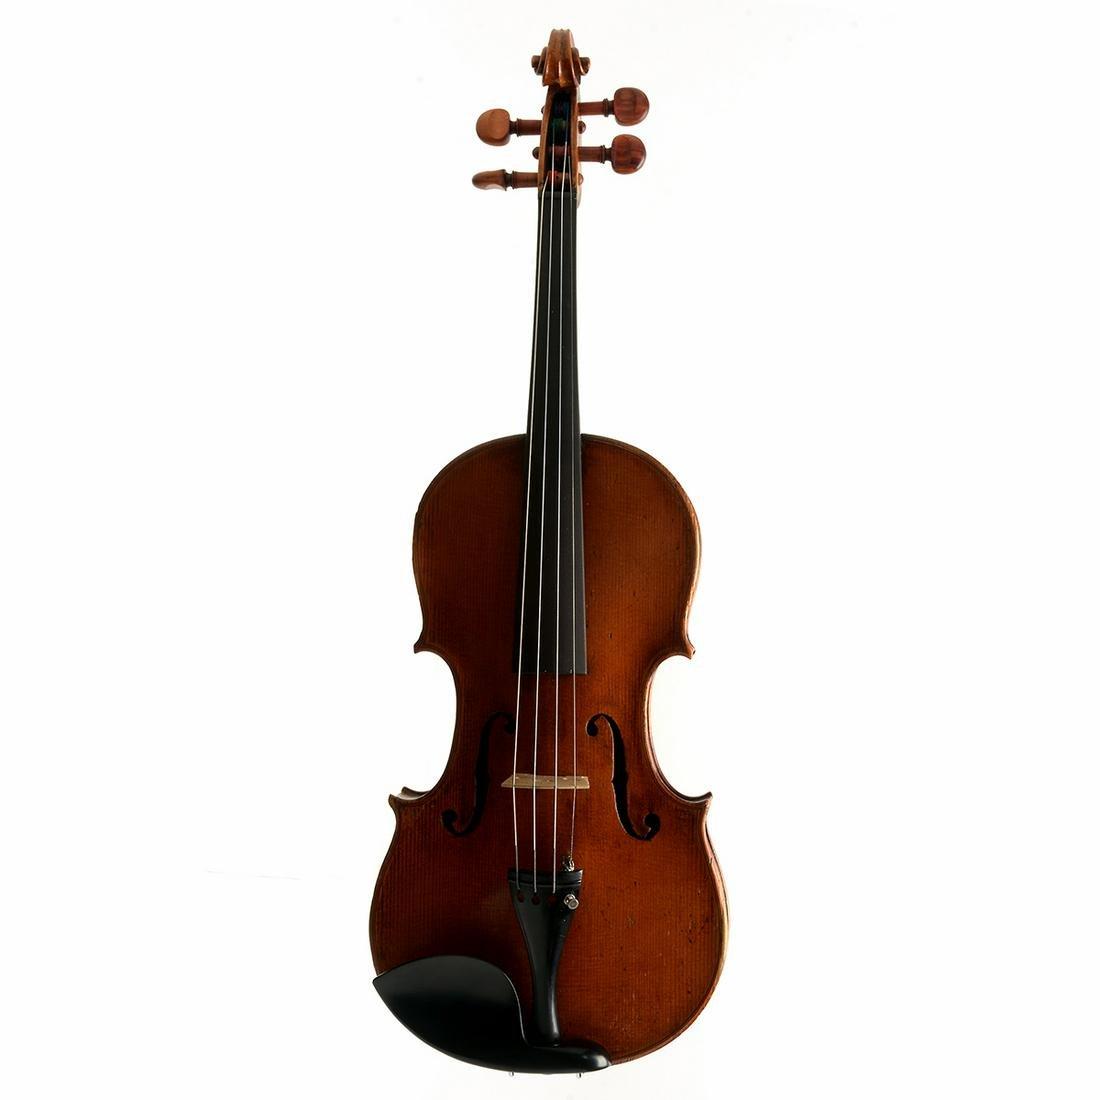 TrefflÈ Gervais American Violin, Early 20th Century.